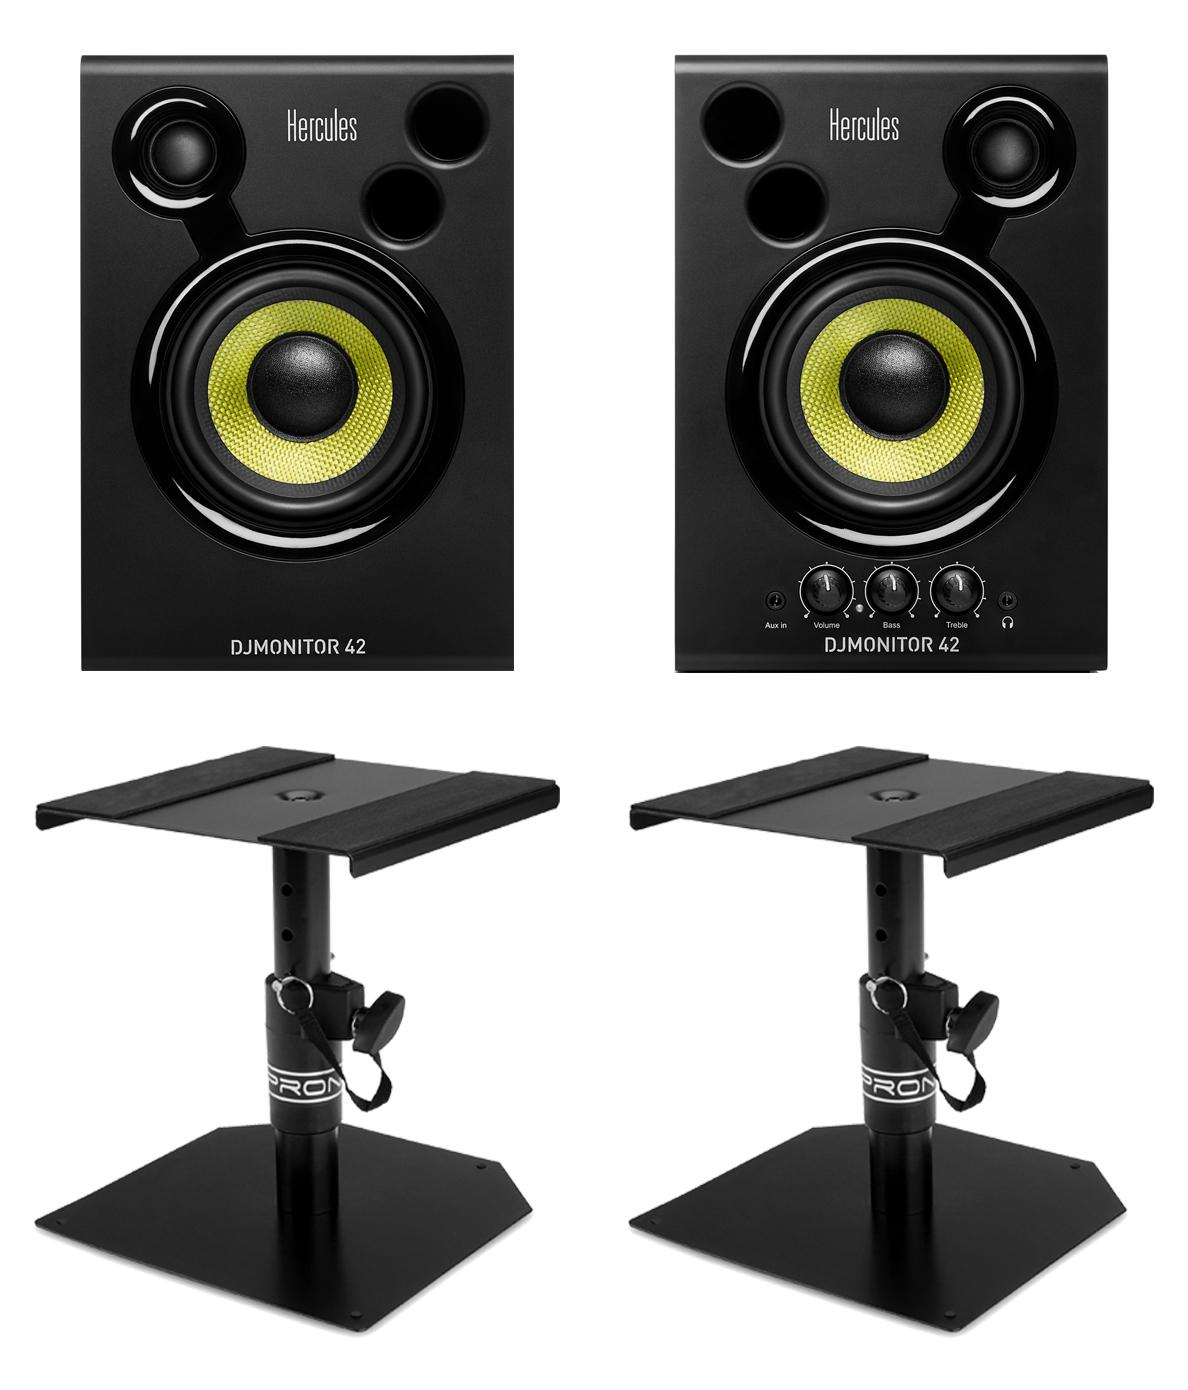 Studiomonitore - Hercules DJMonitor 42 Tischstativ Set - Onlineshop Musikhaus Kirstein